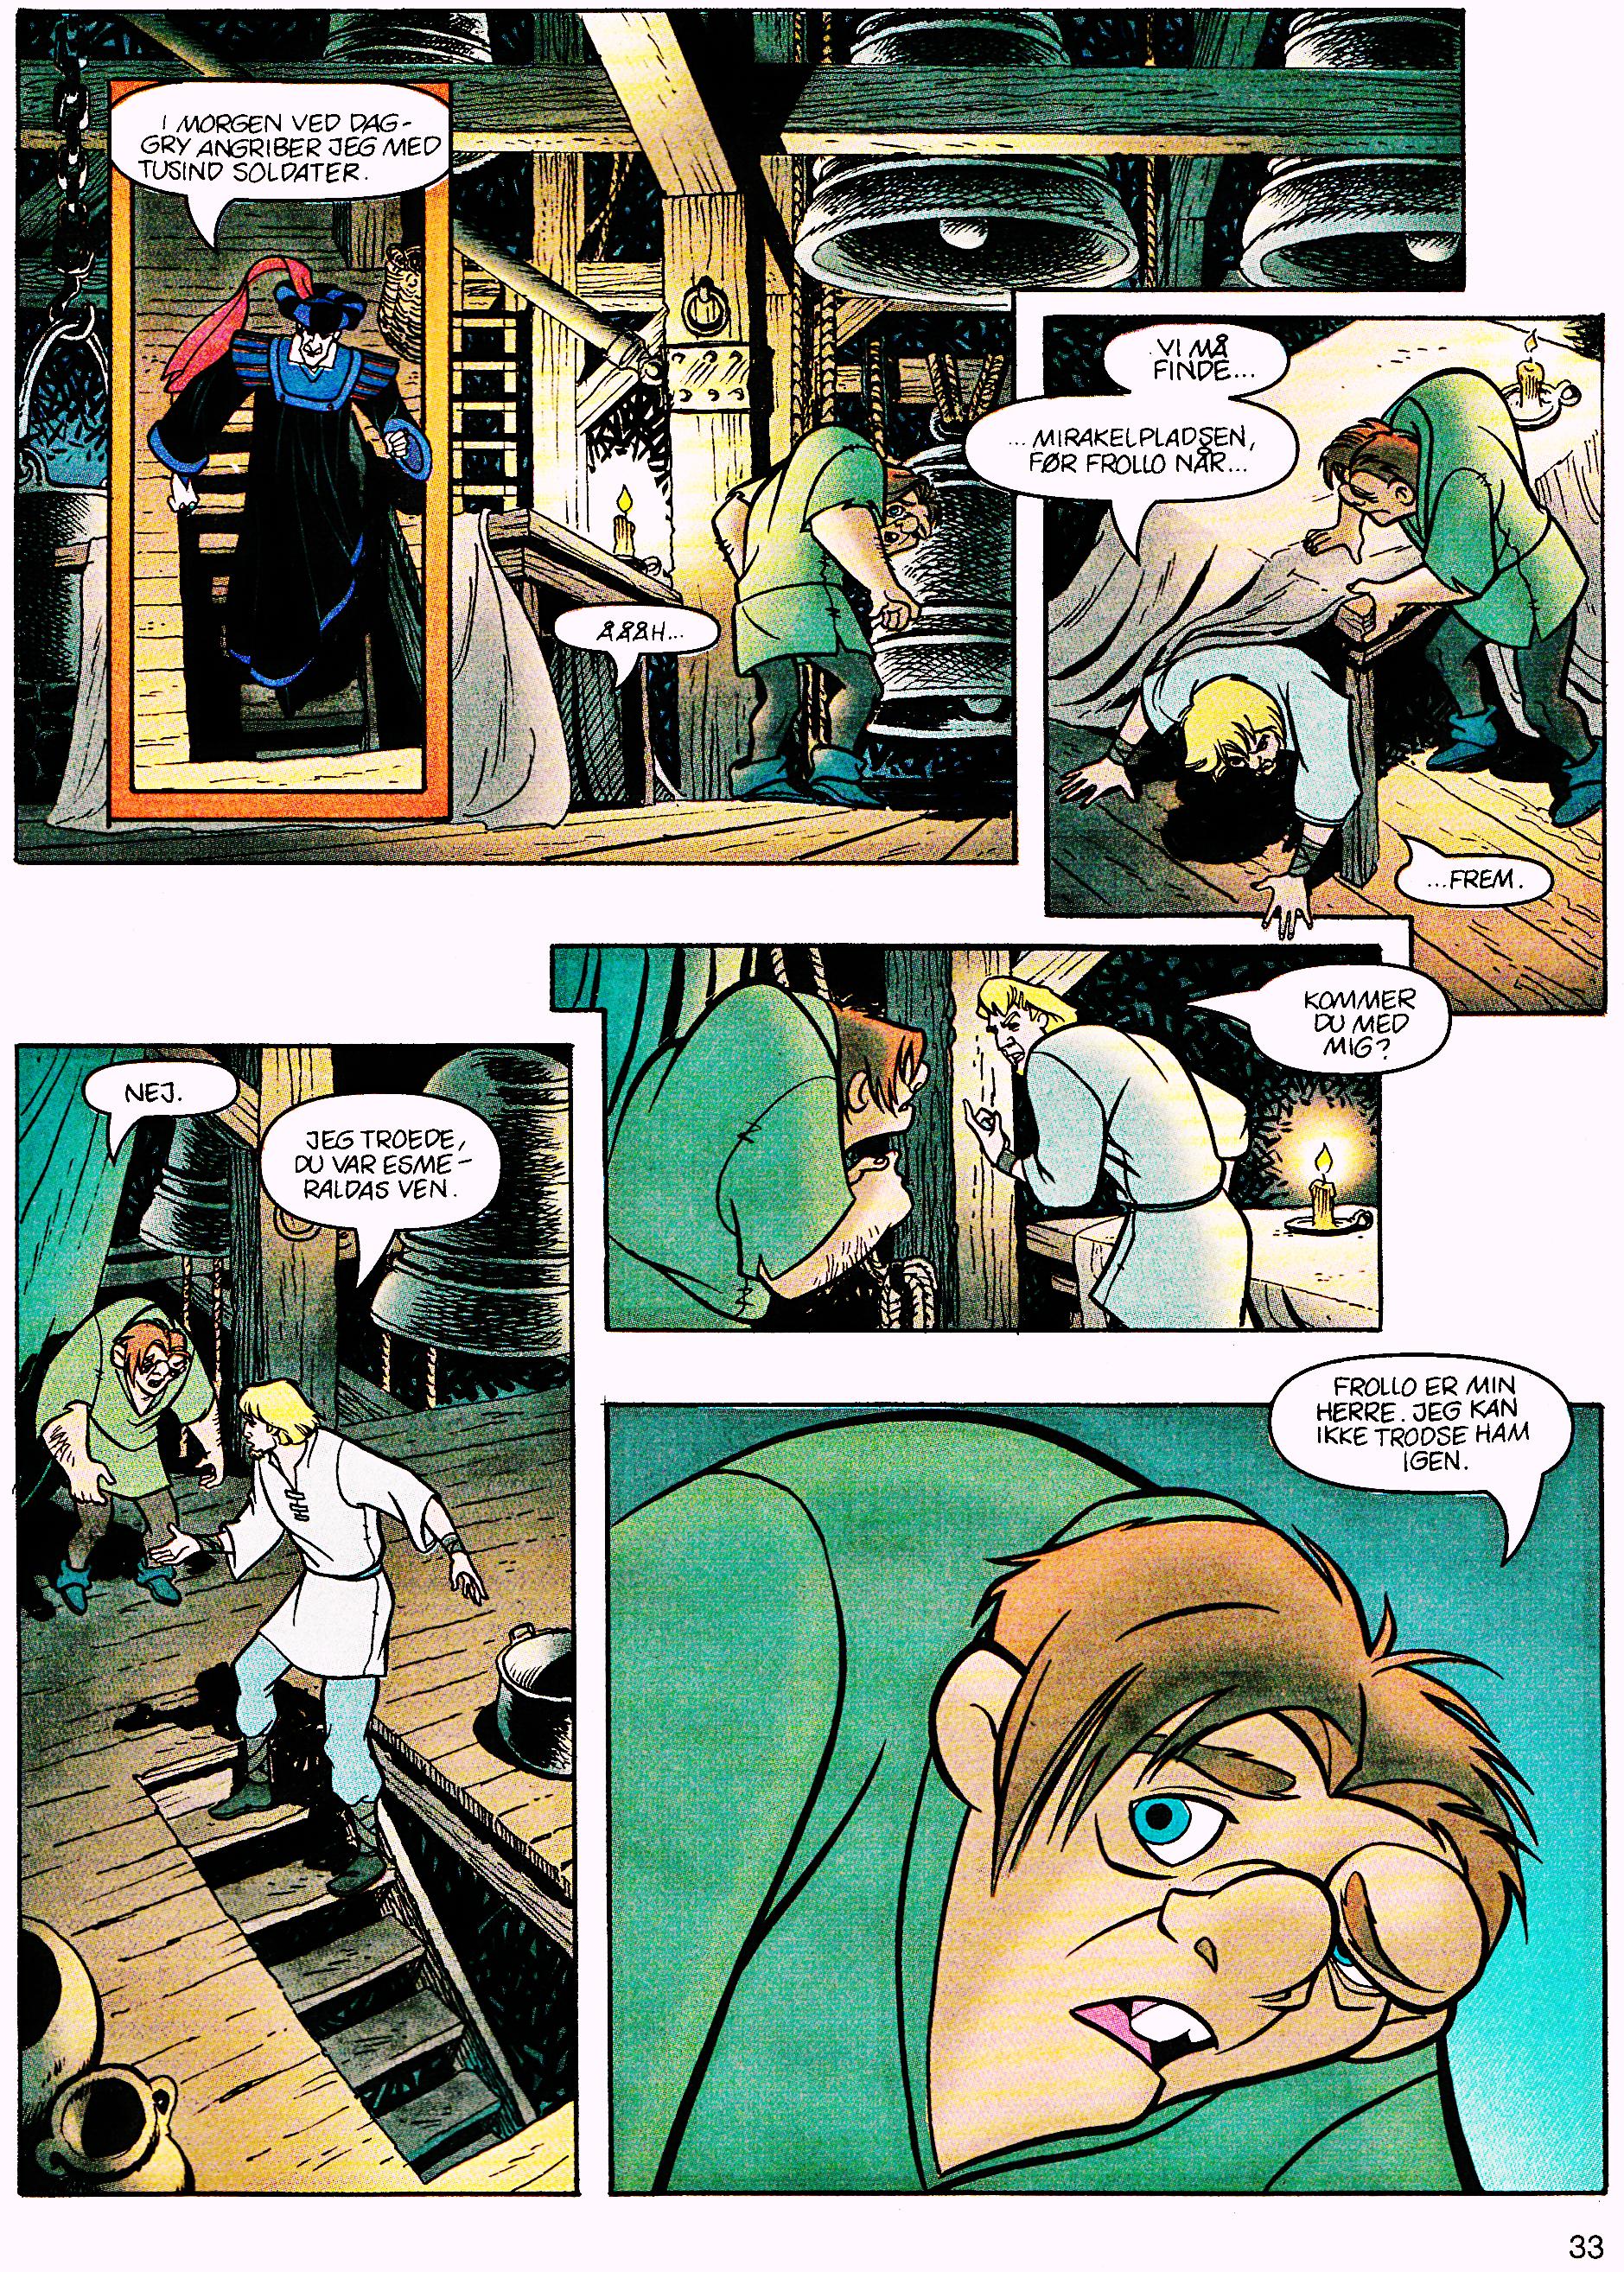 Walt Disney Movie Comics - The Hunchback of Notre Dame (Danish Version)